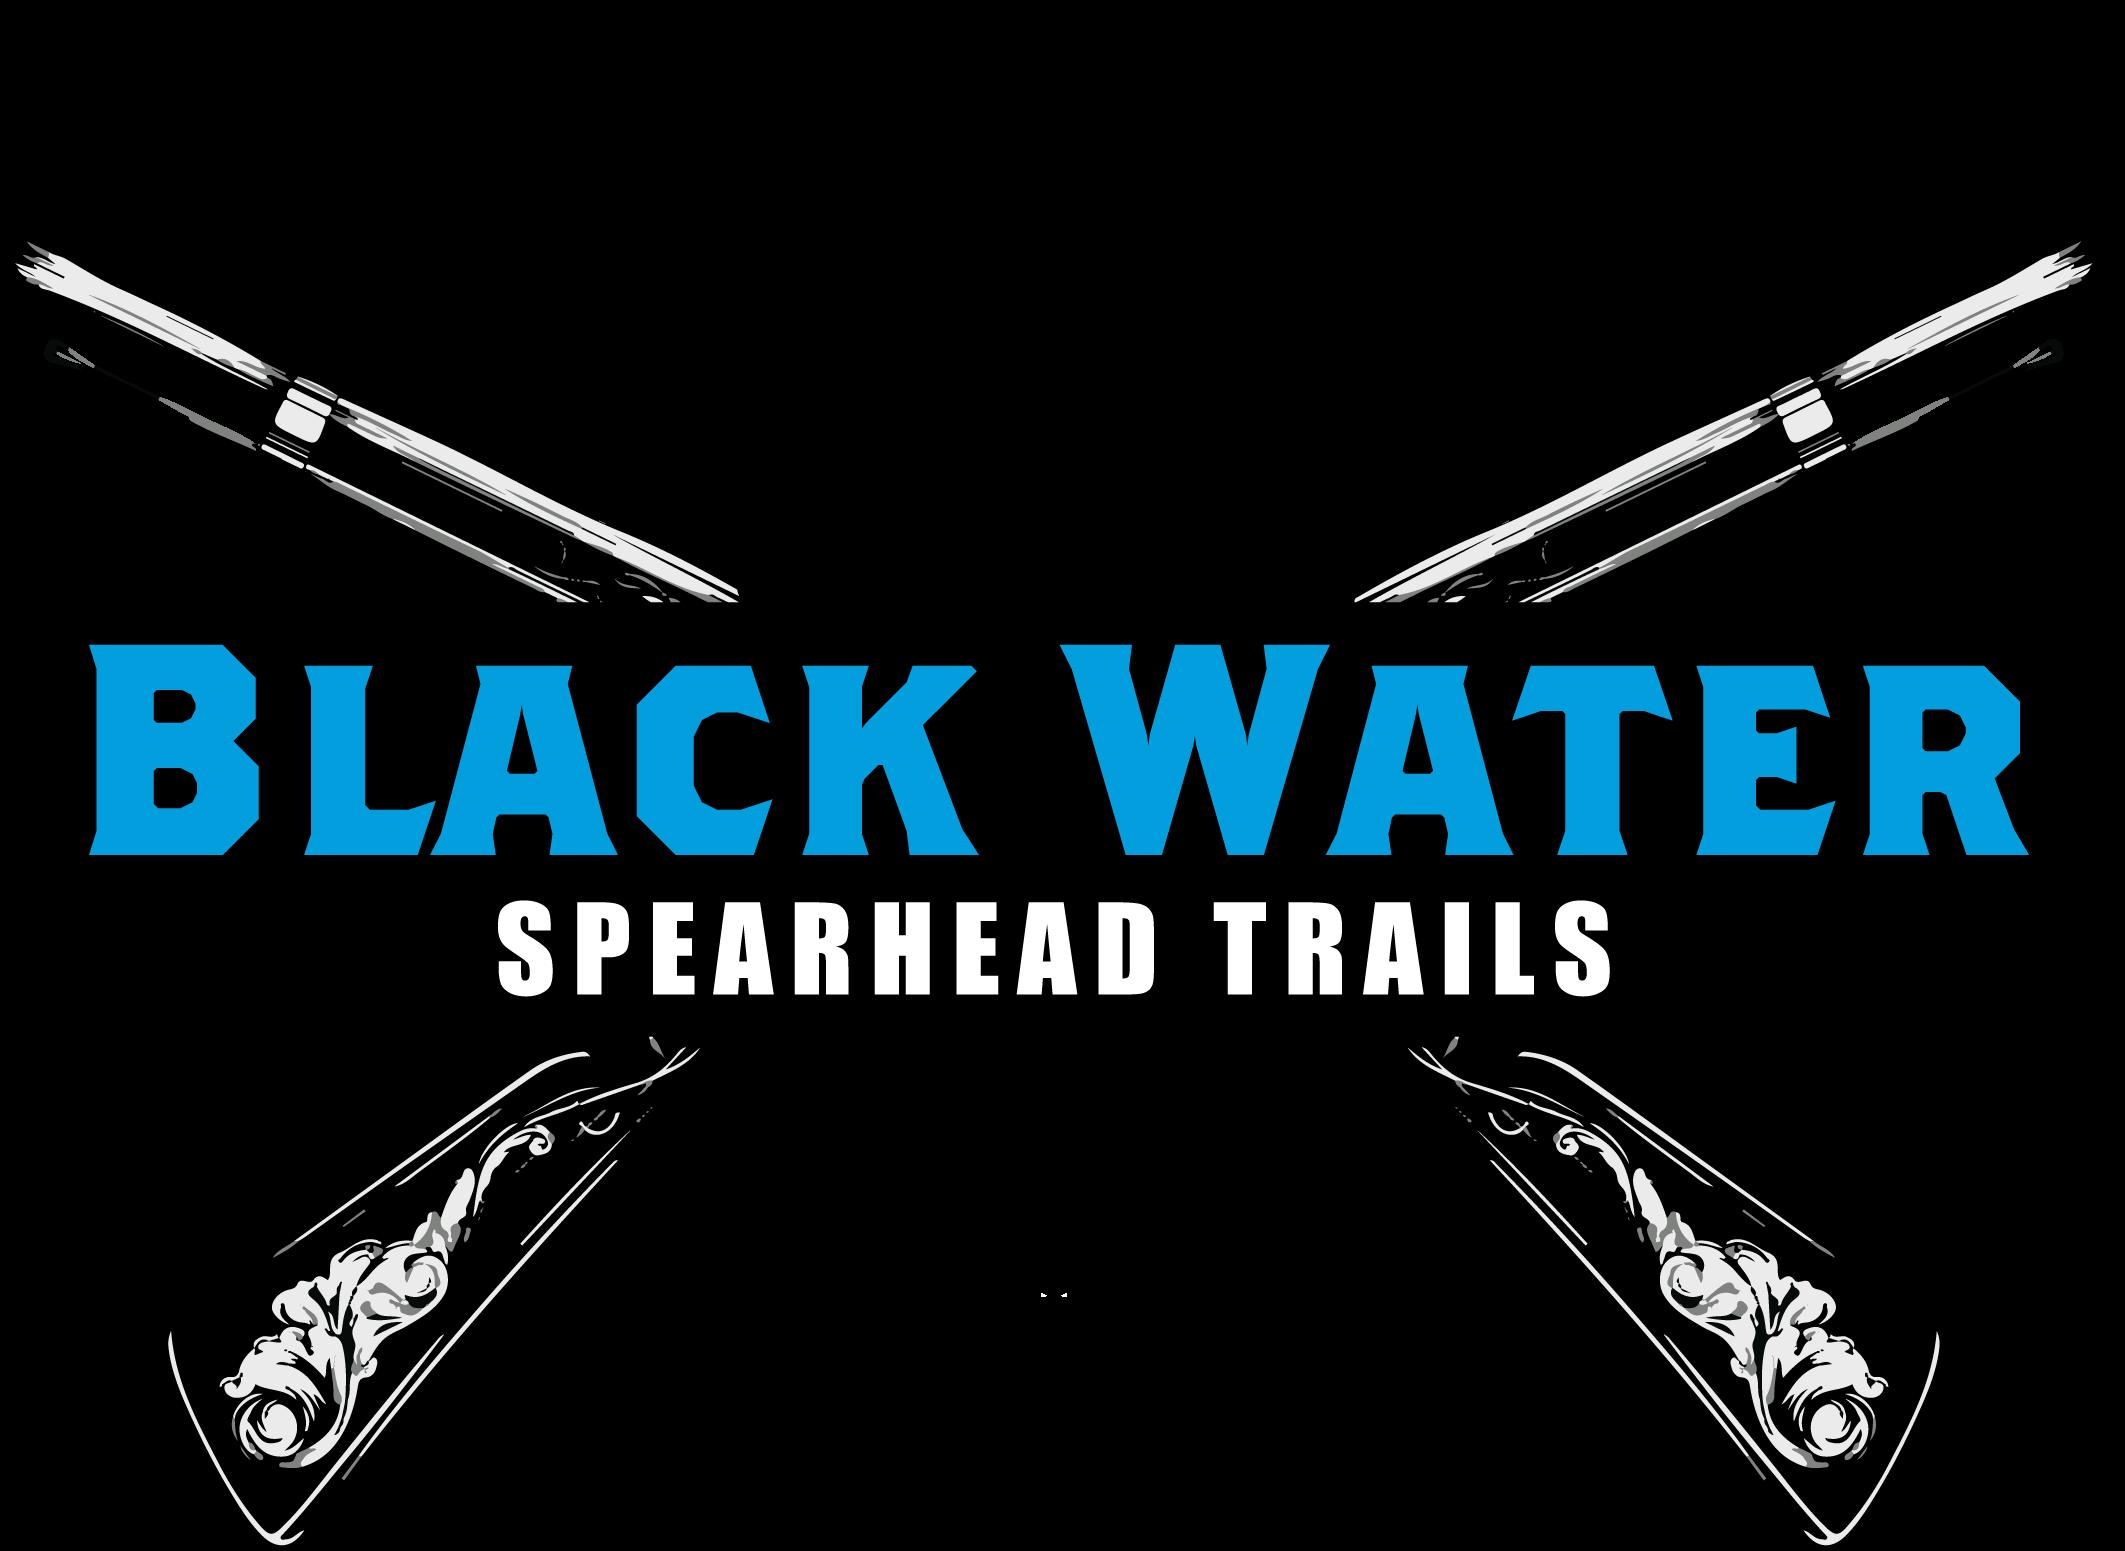 https://spearheadtrails.com/wp-content/uploads/2020/05/black-water2.png